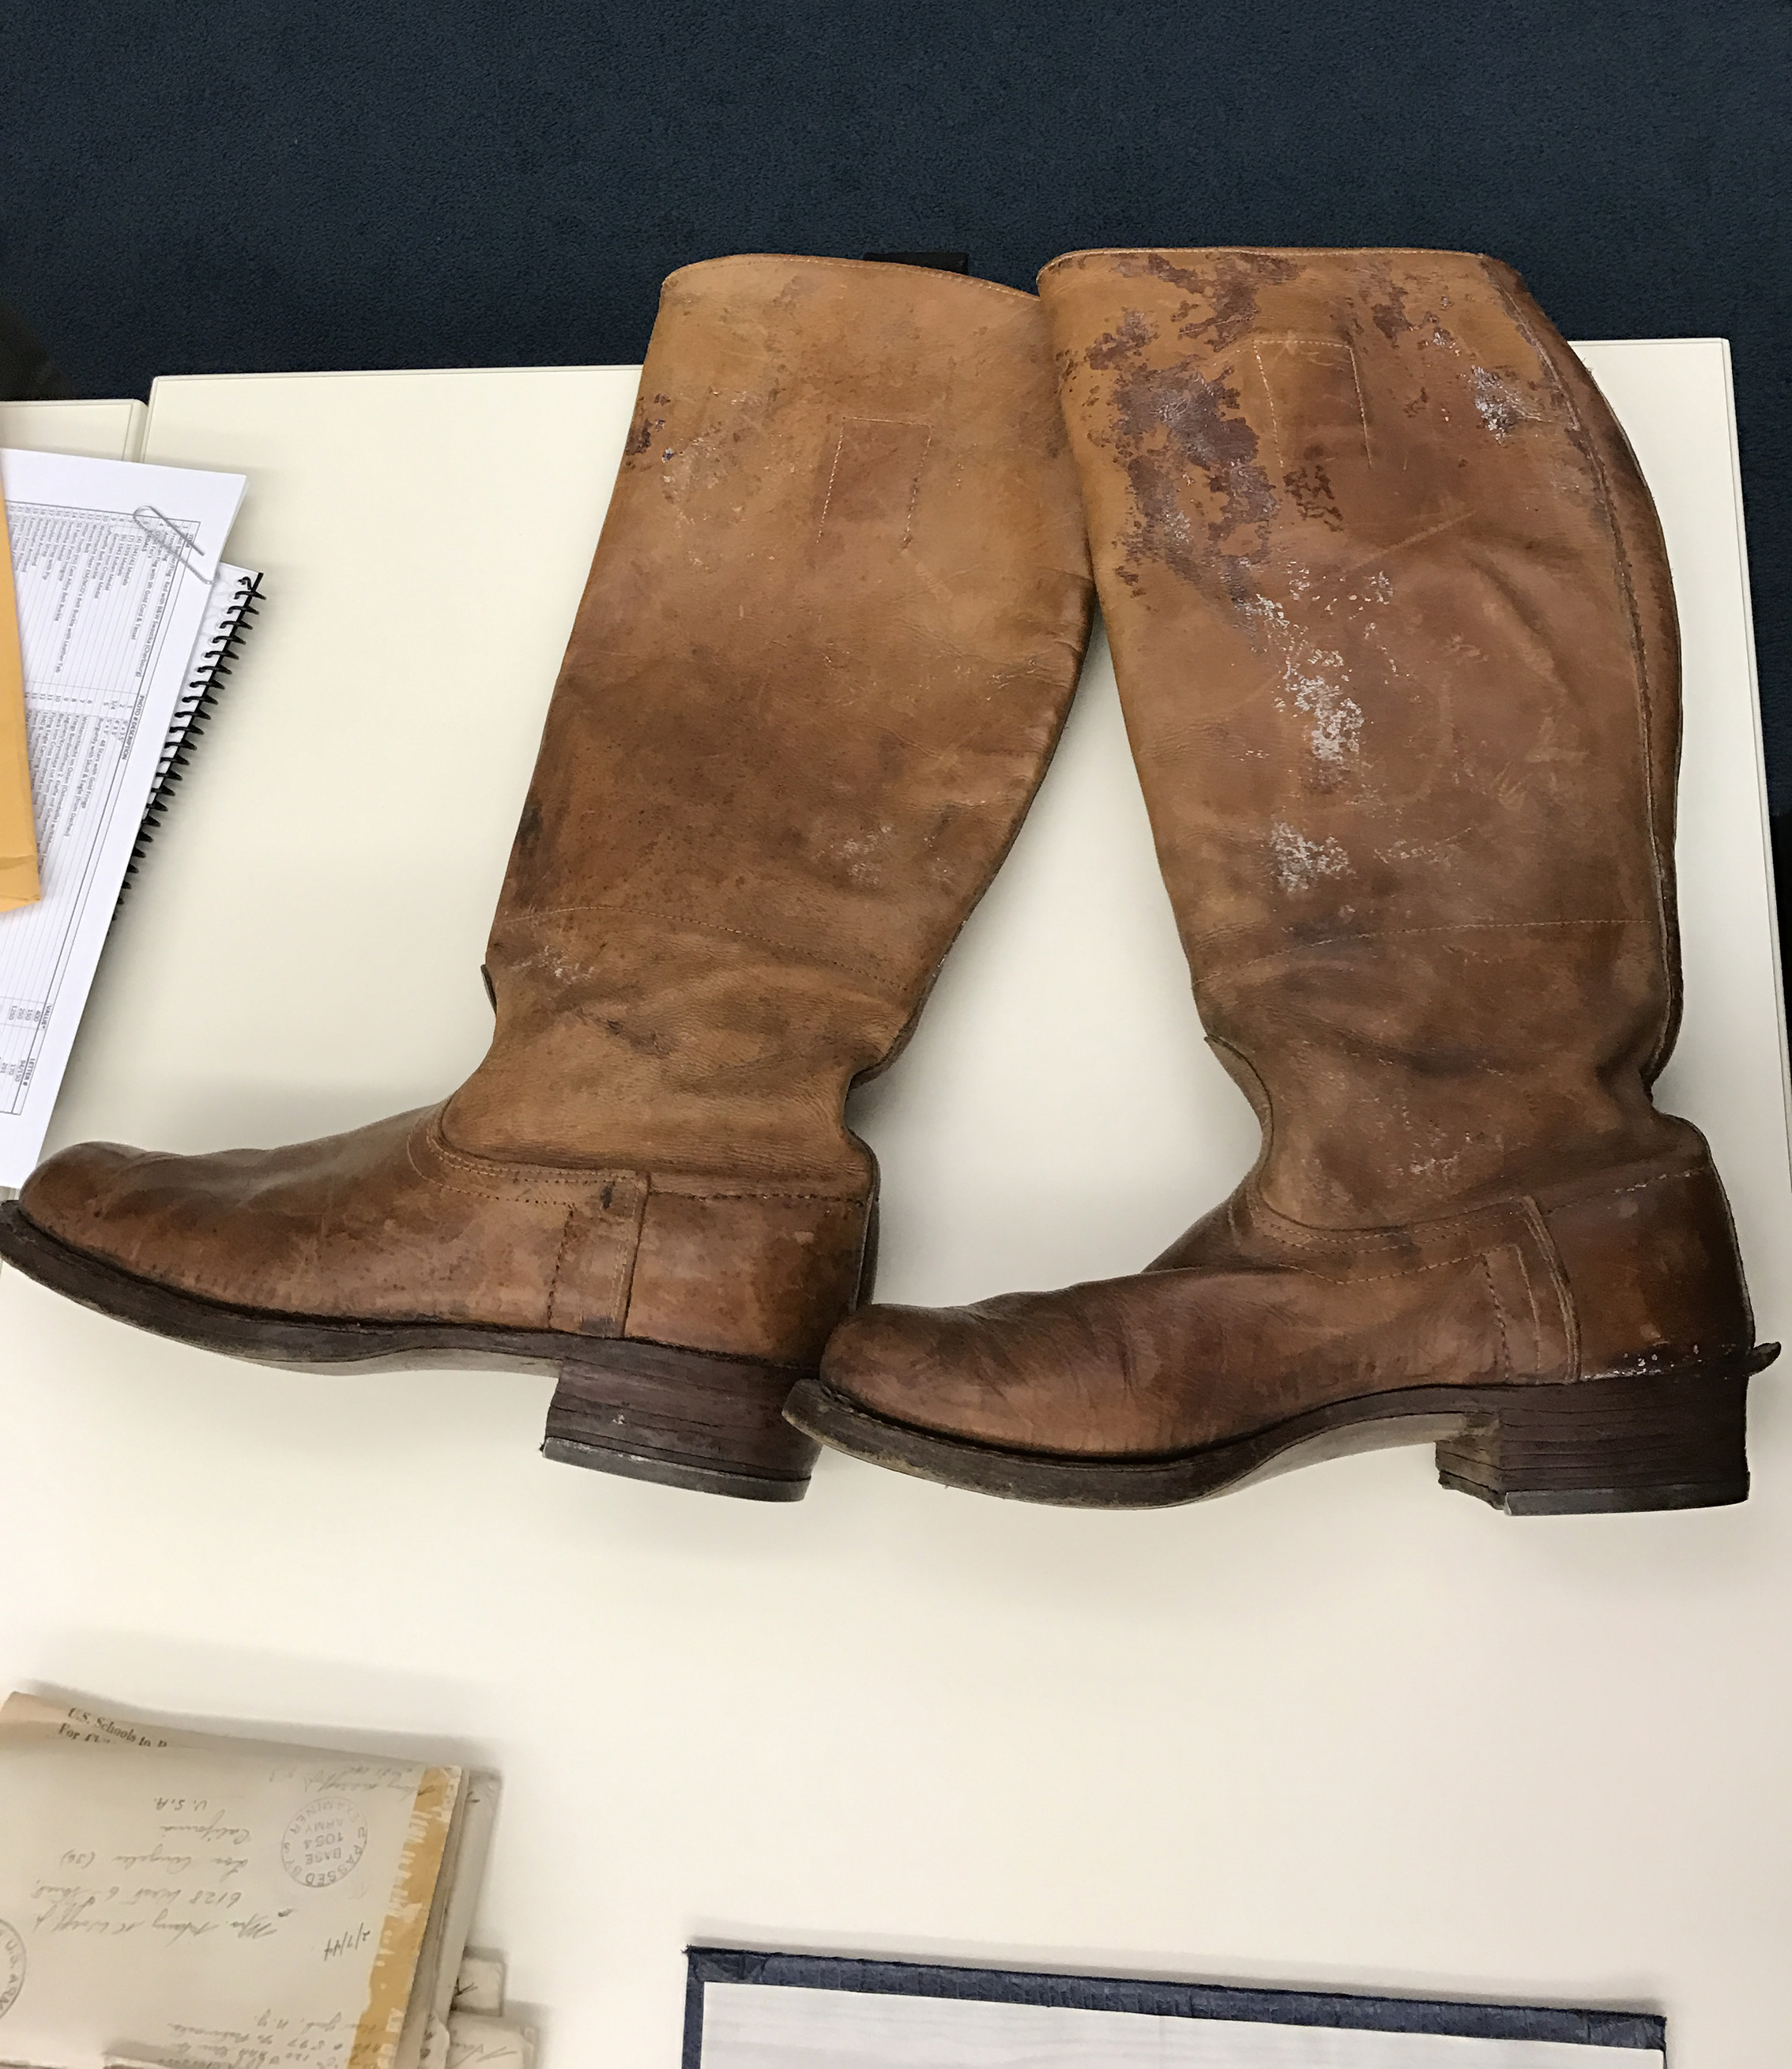 Boots a Holocaust survivor made for Lt. Wolff